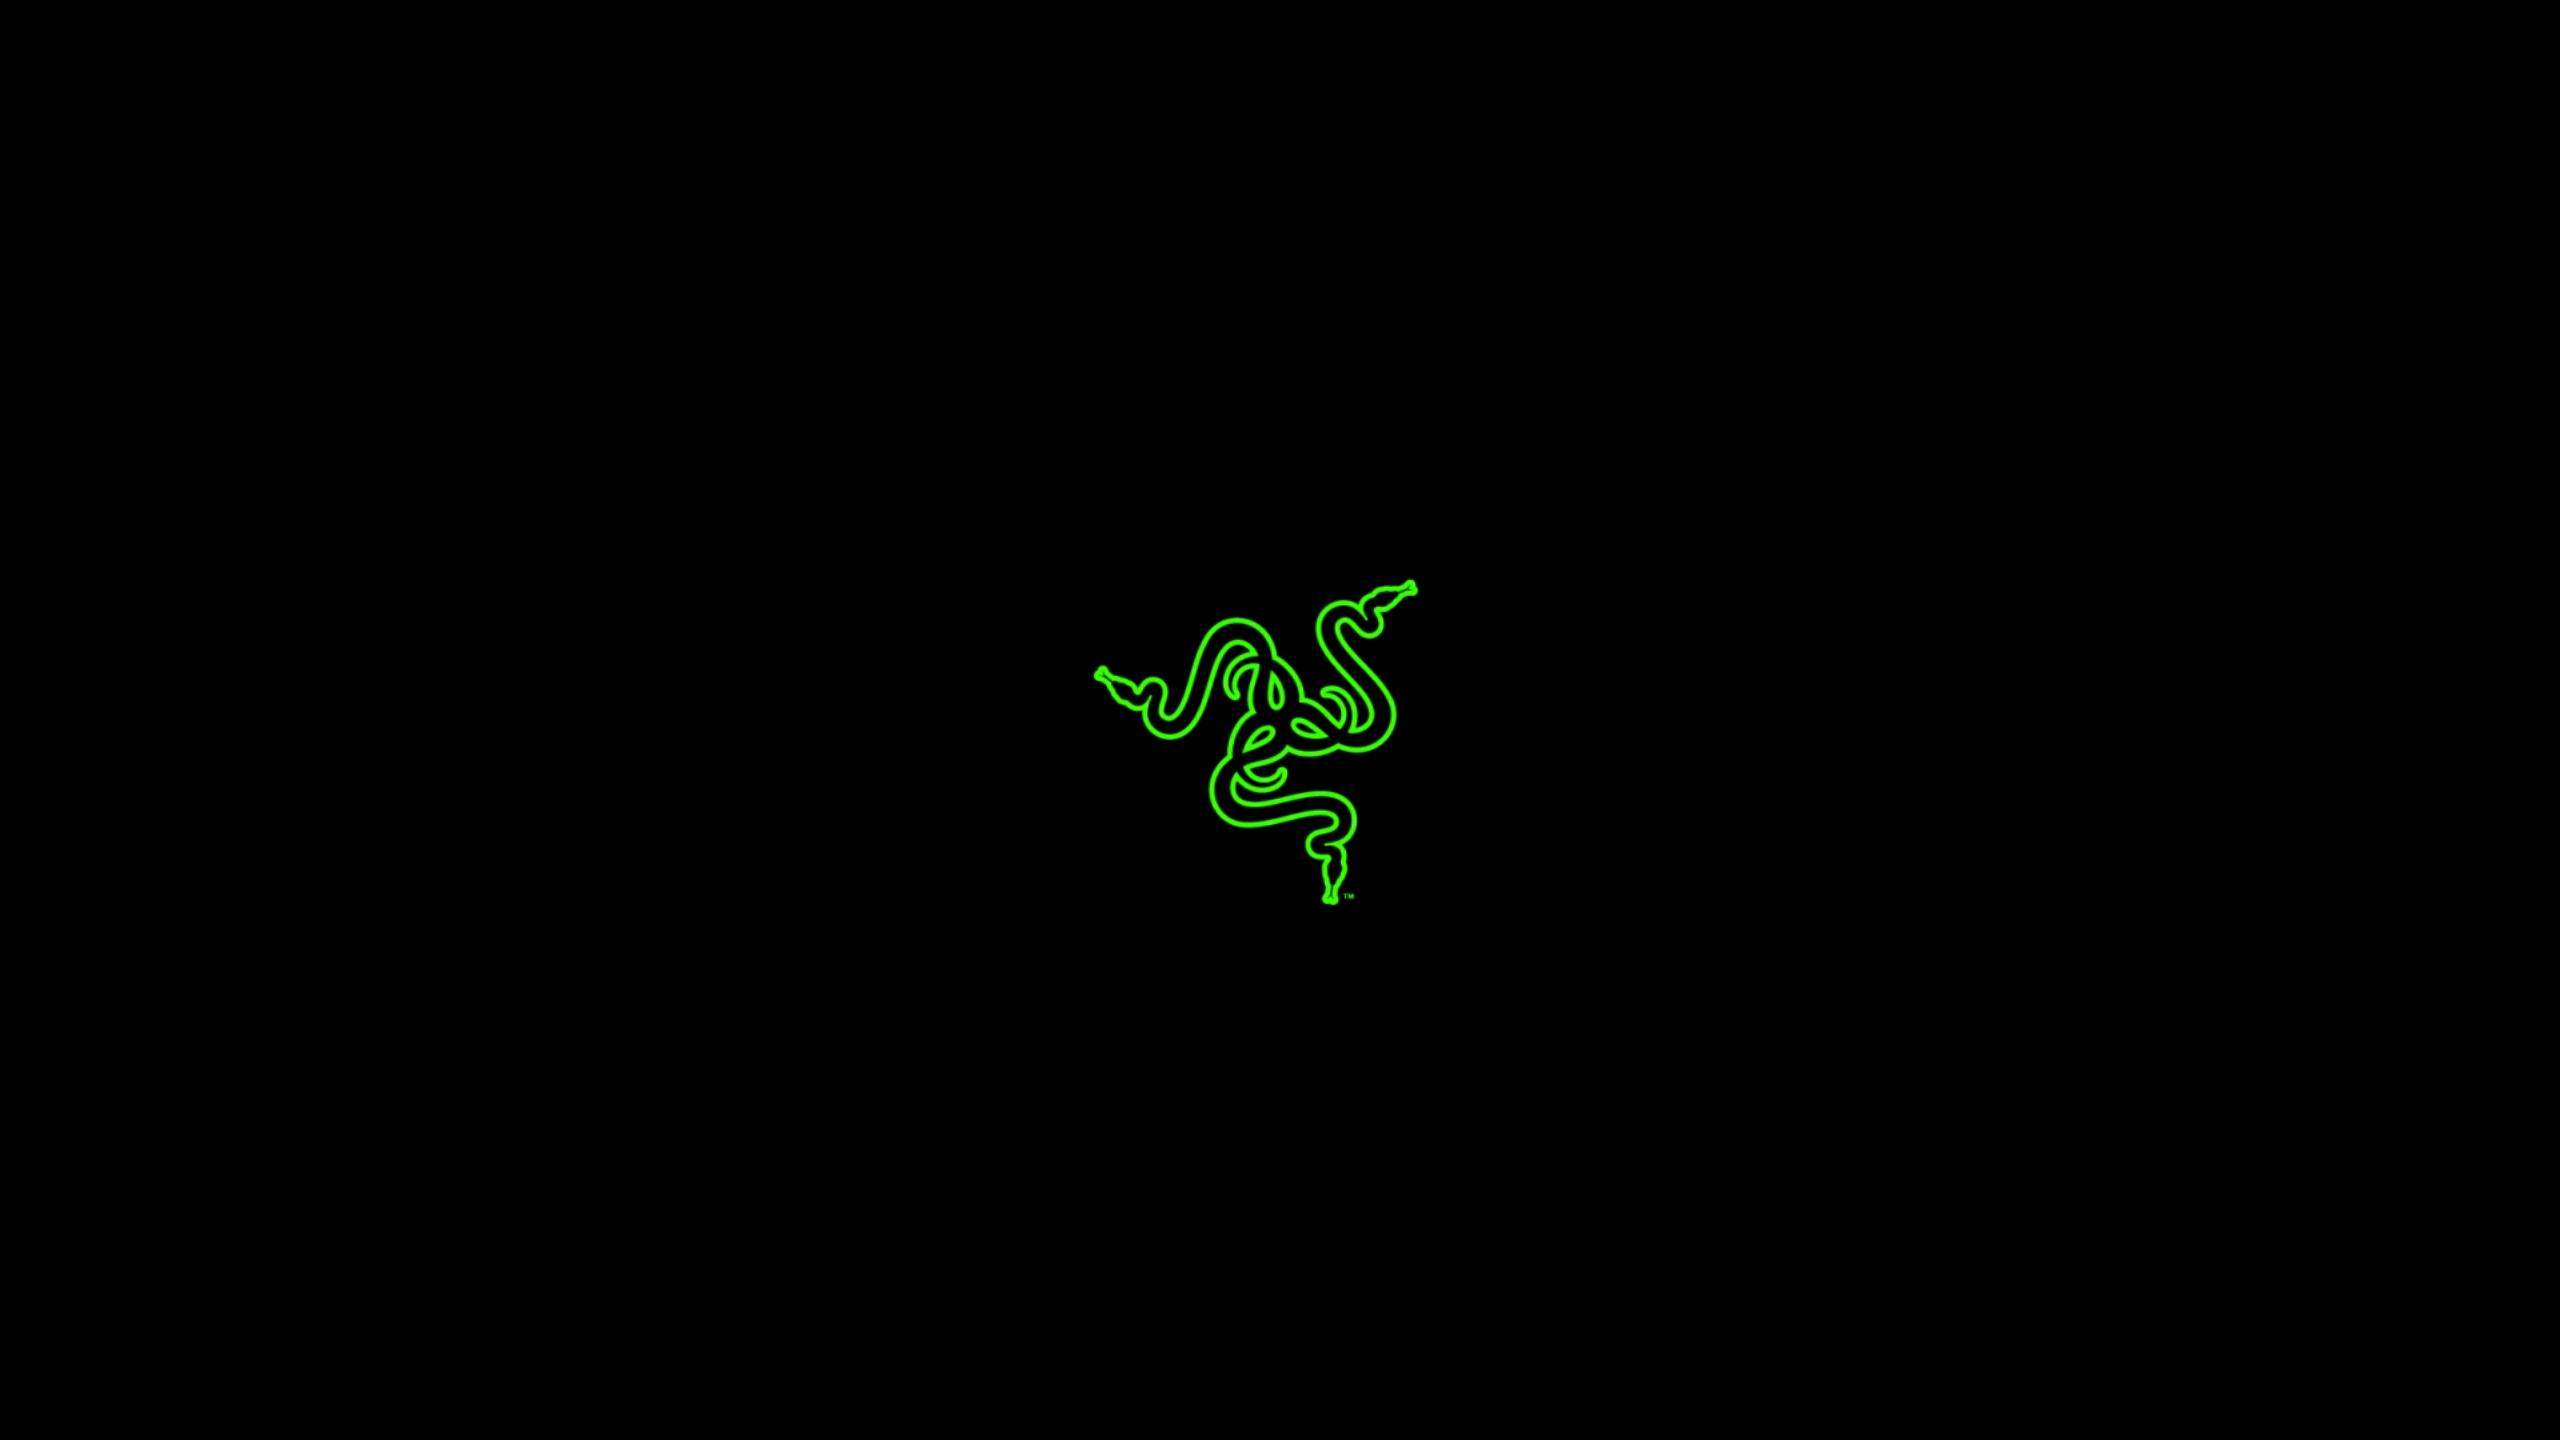 Wallpaper text logo insect pc gaming pc master race - Gaming logo wallpaper ...